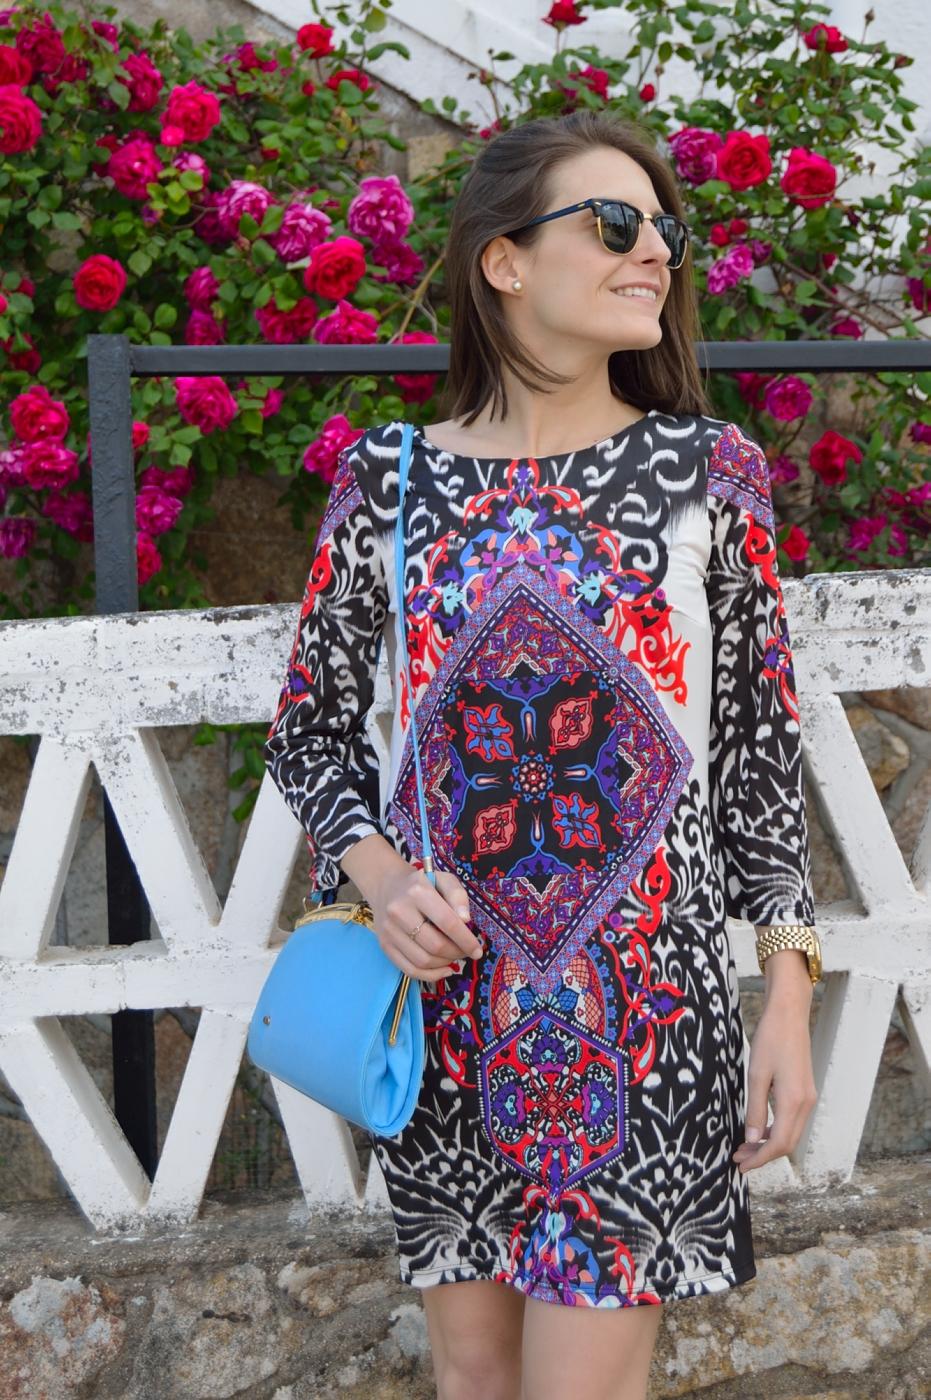 lara-vazquez-madlula-blog-fashion-moda-dress-spring-style